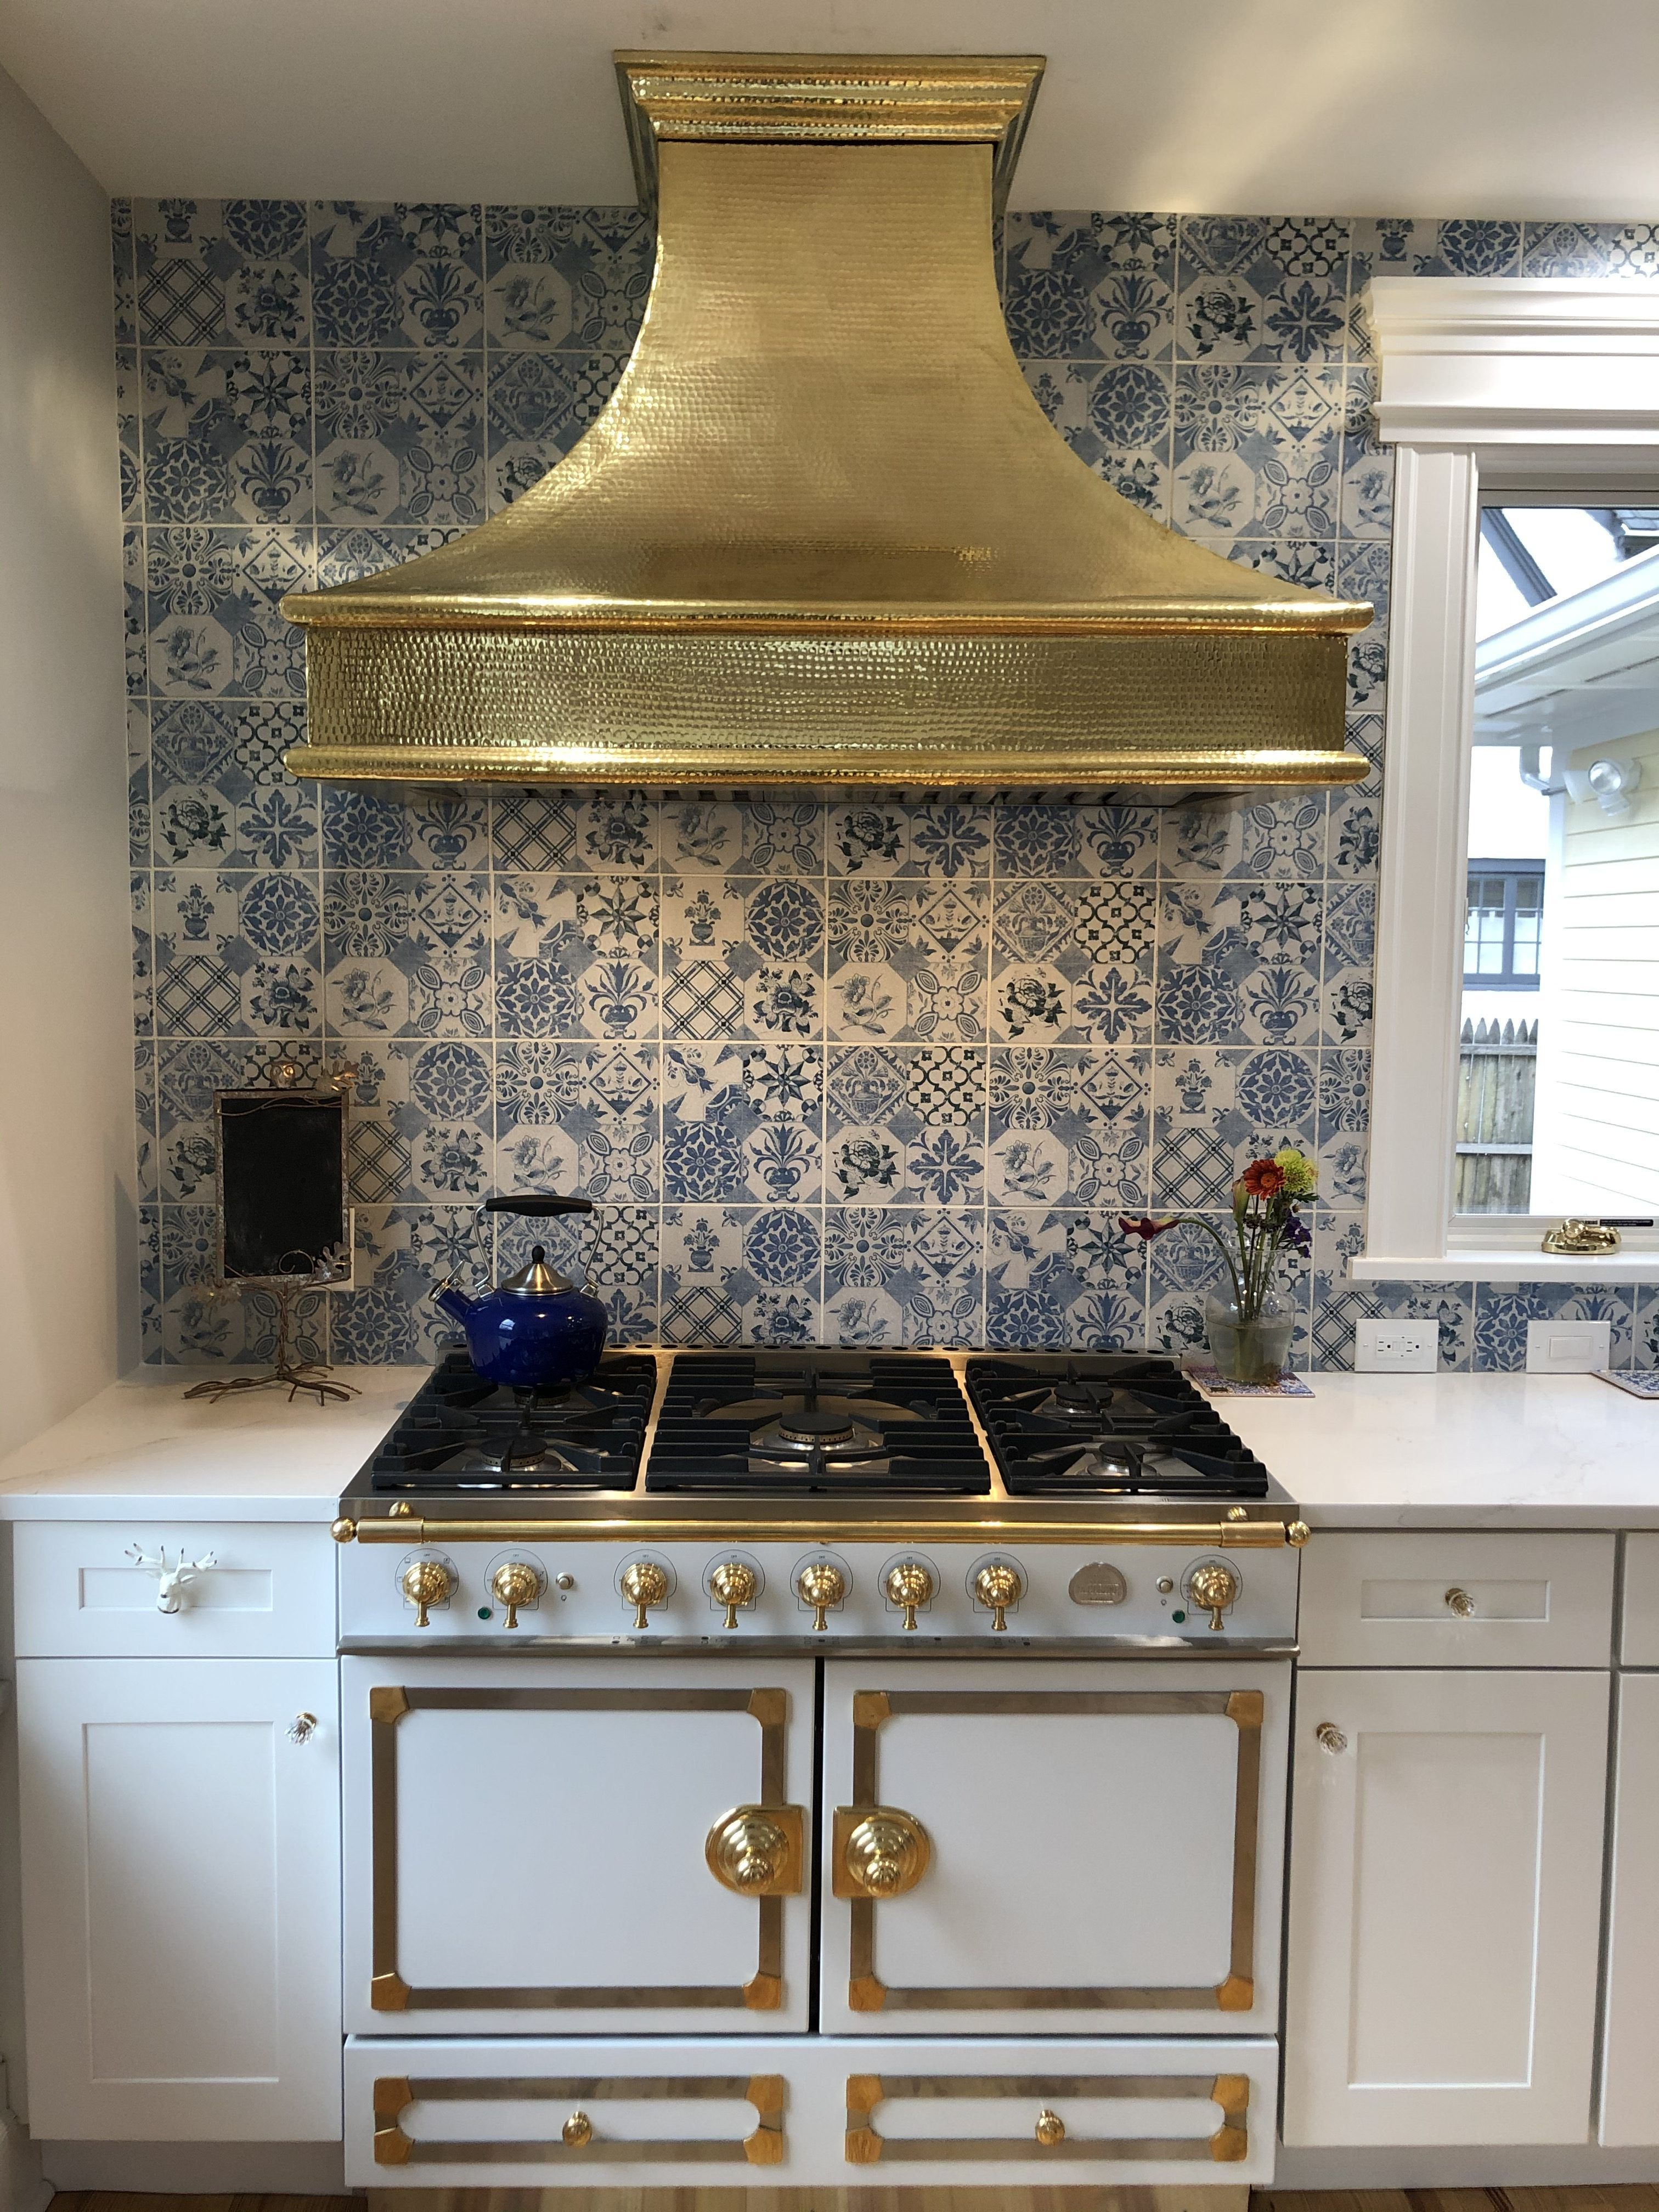 The Ultimate Range Hood Buyers Guide Coppersmith Kitchen Ventilation Tuscan Kitchen Range Hood